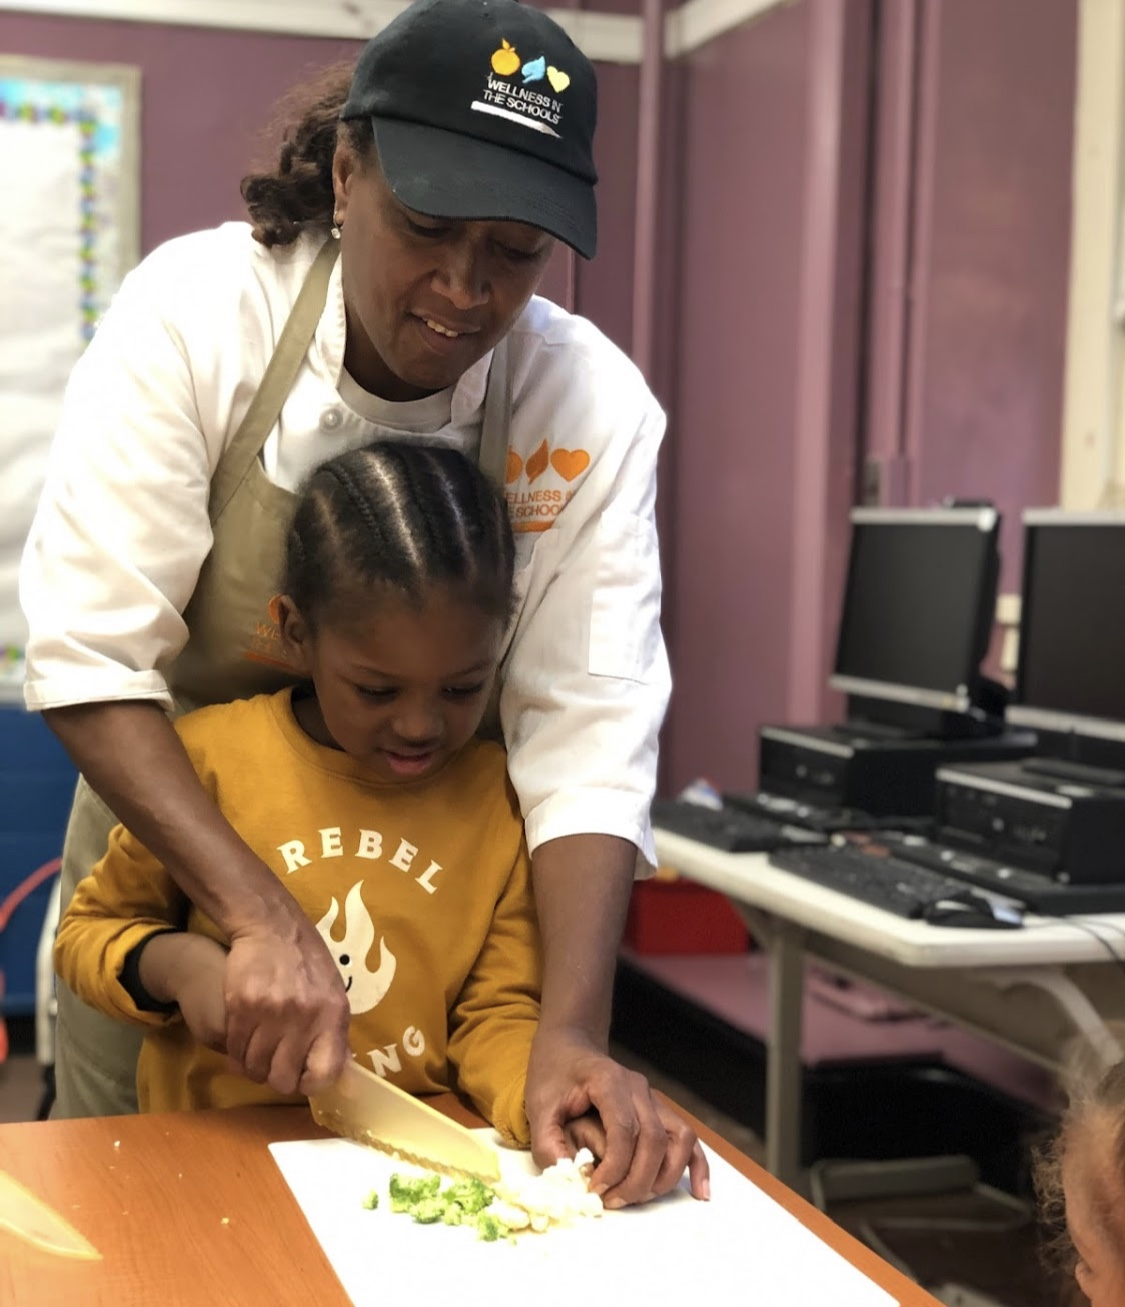 School Food Innovation Lab: A Collaborative Effort to Revolutionize School Food